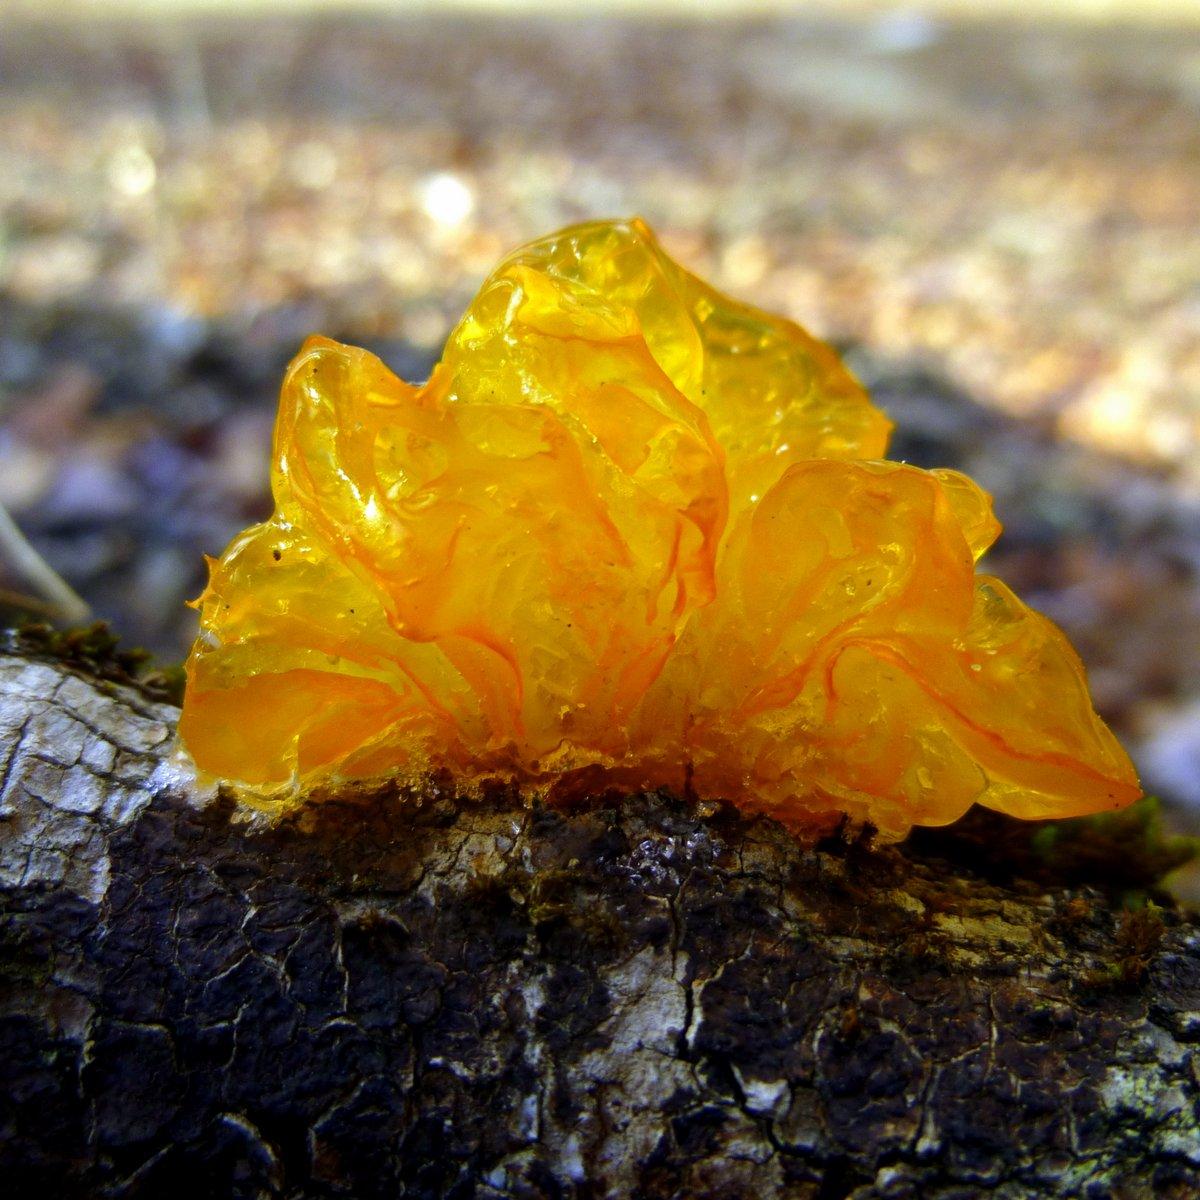 12. Jelly Fungus